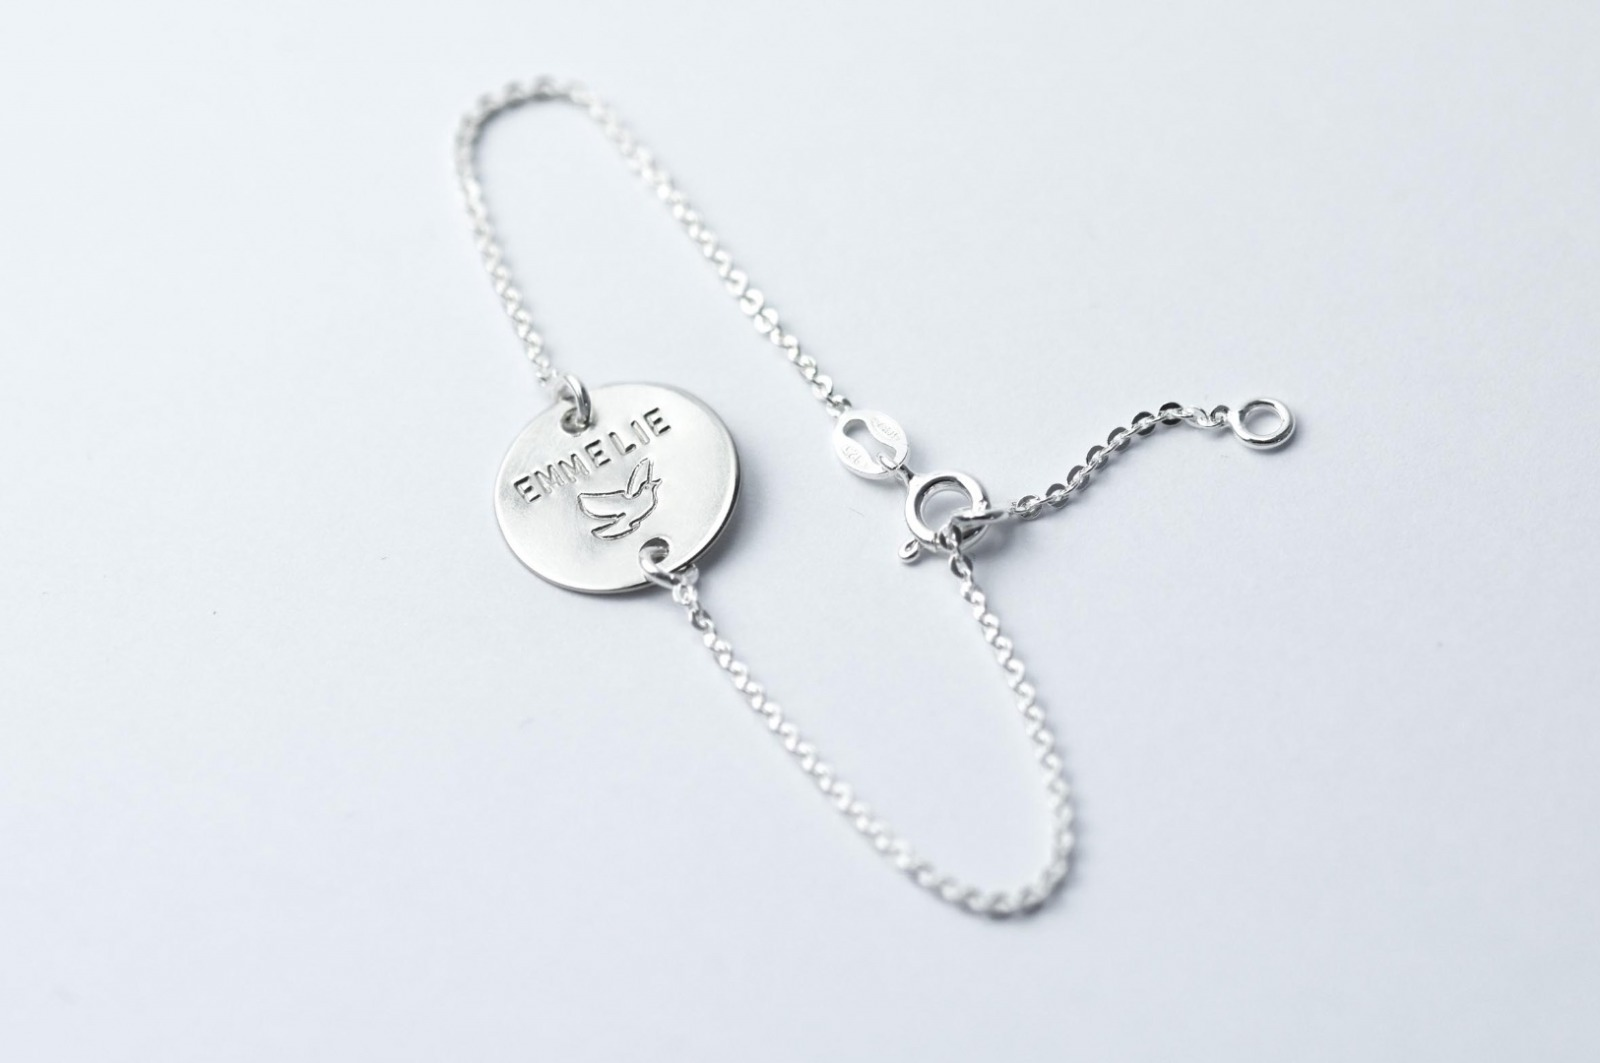 Zartes Silberarmband 1 - Namens- Geburts- Spruchband